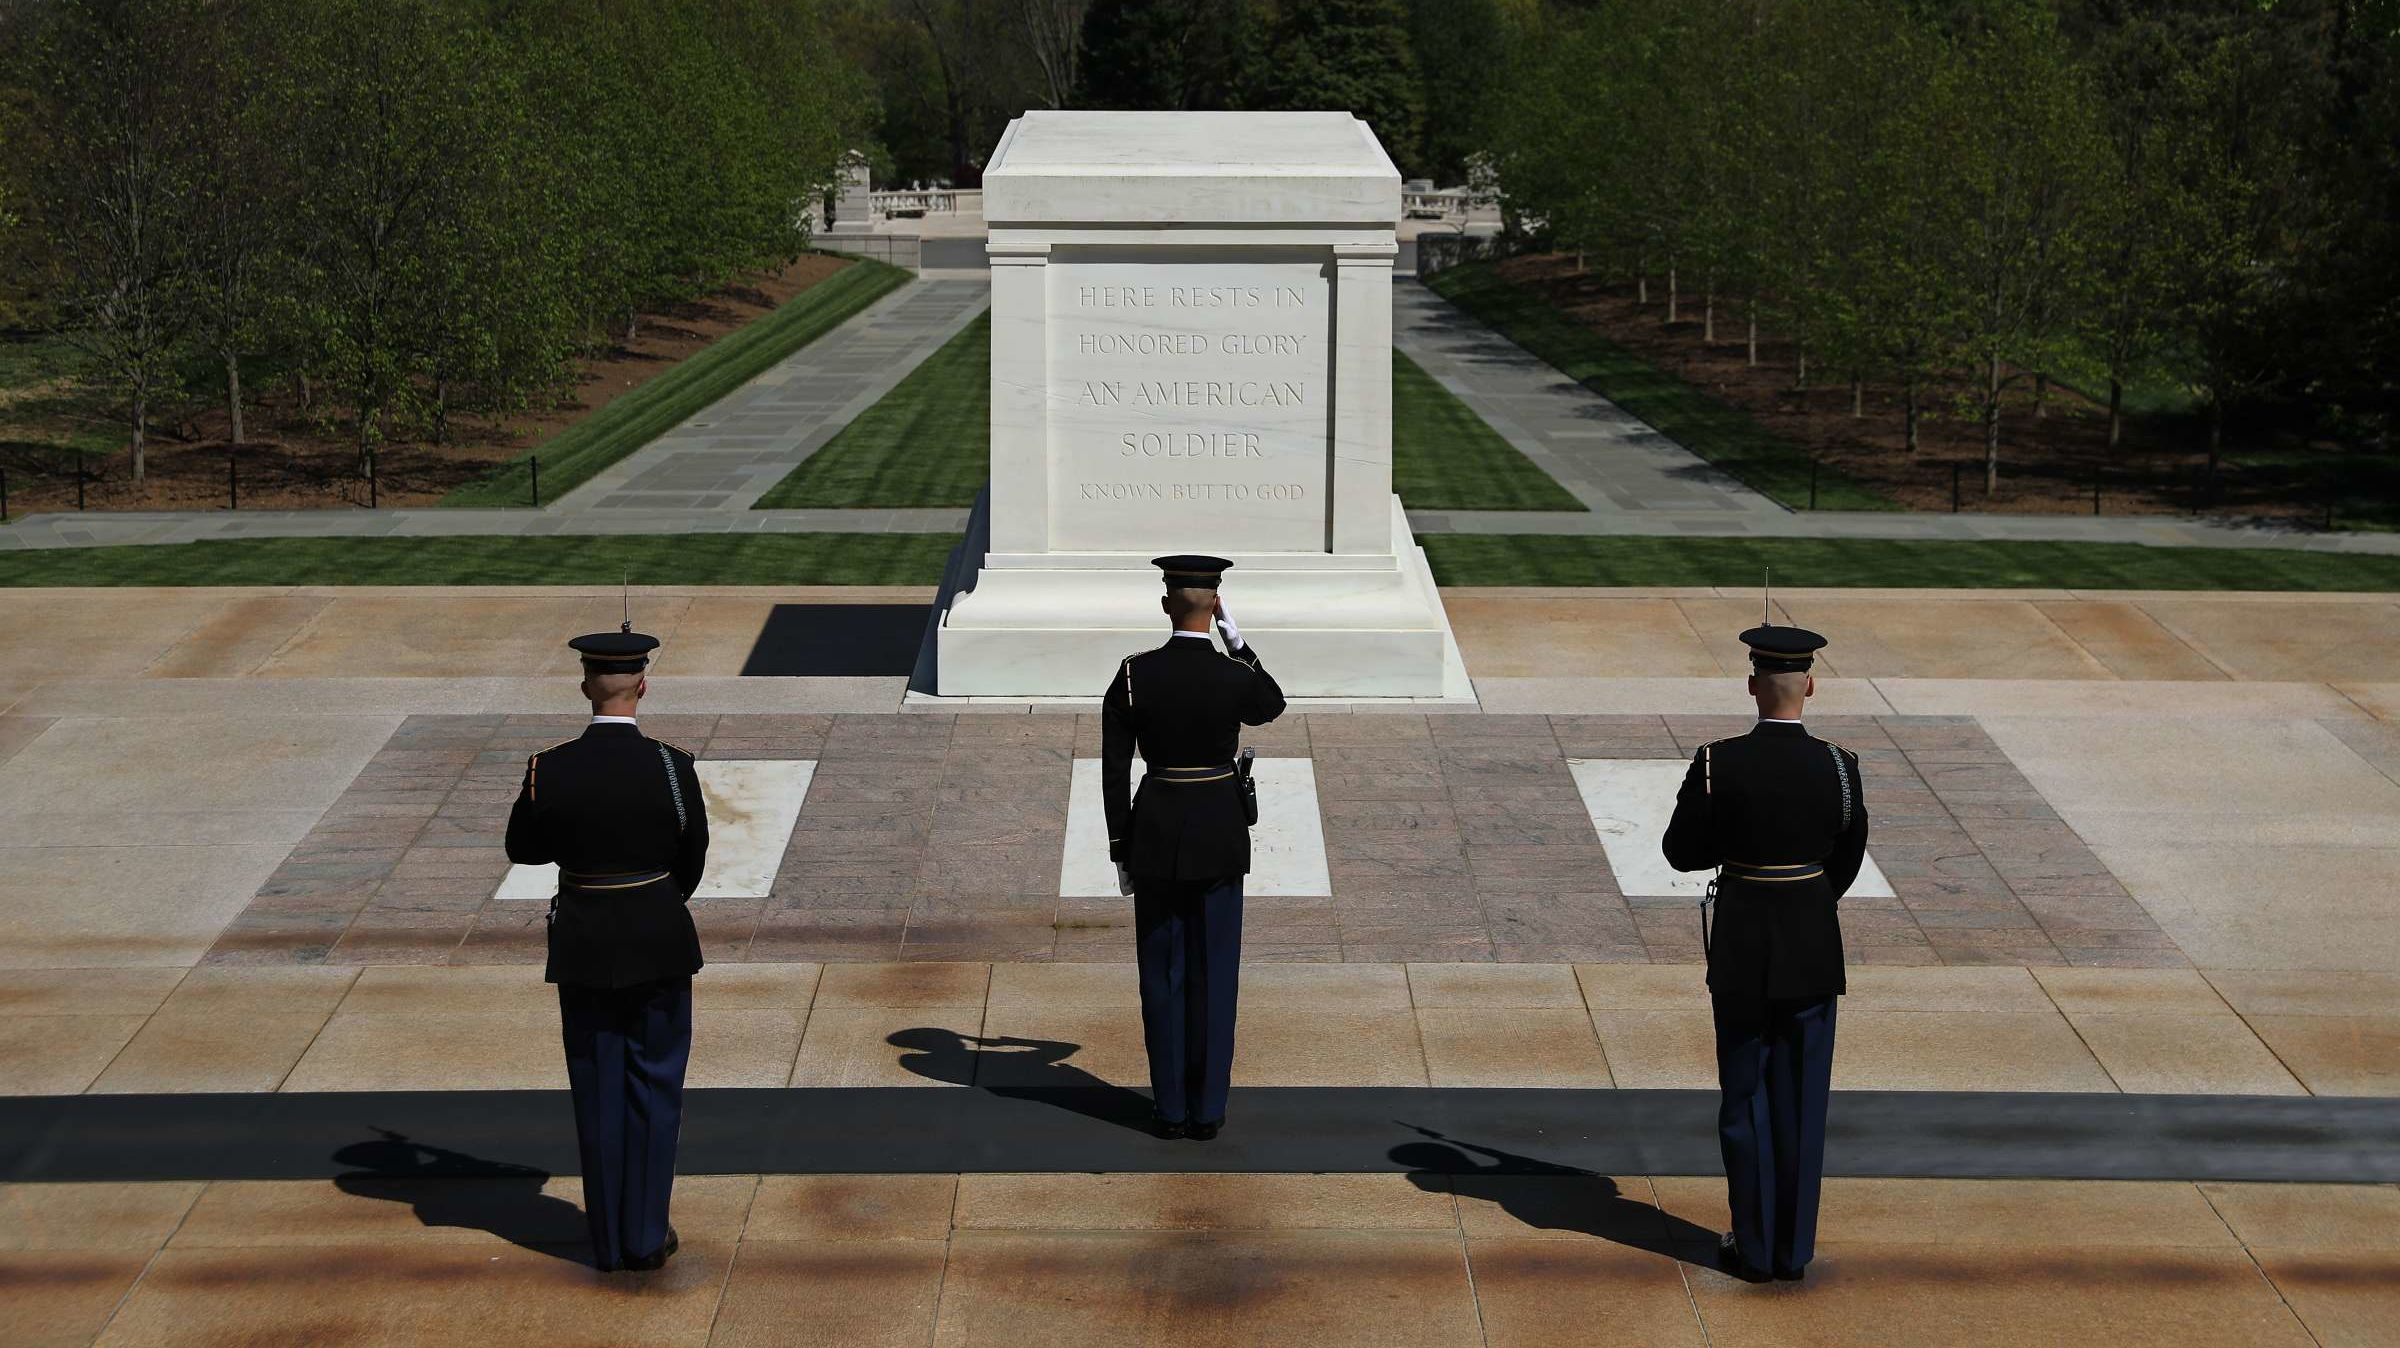 4 Memorial to Glory